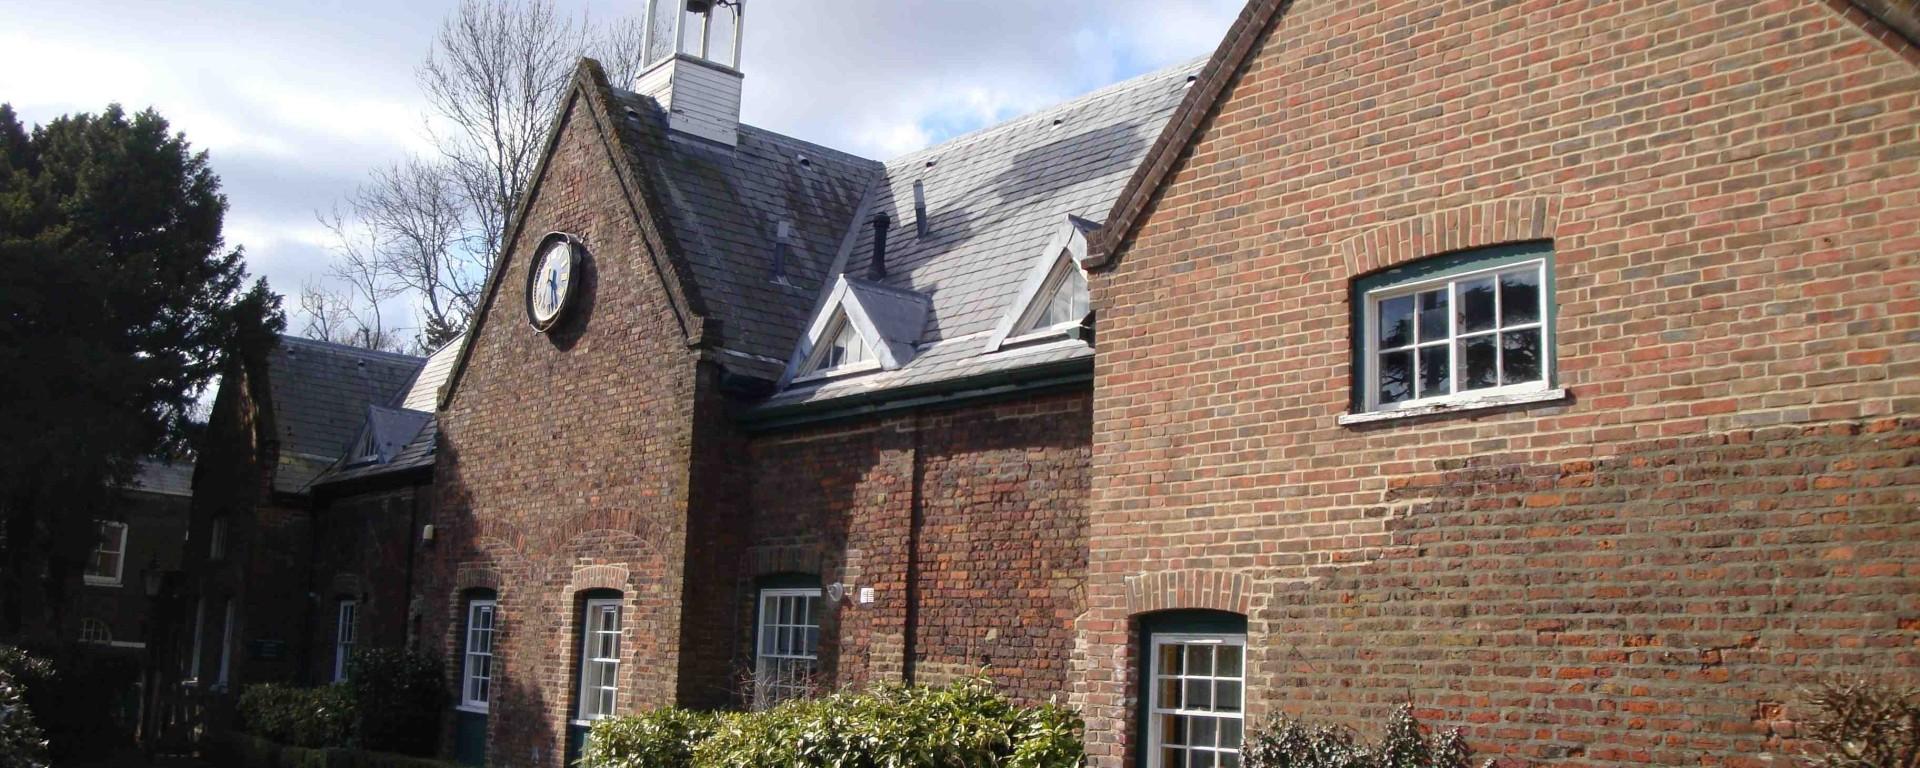 Boston Manor Stables